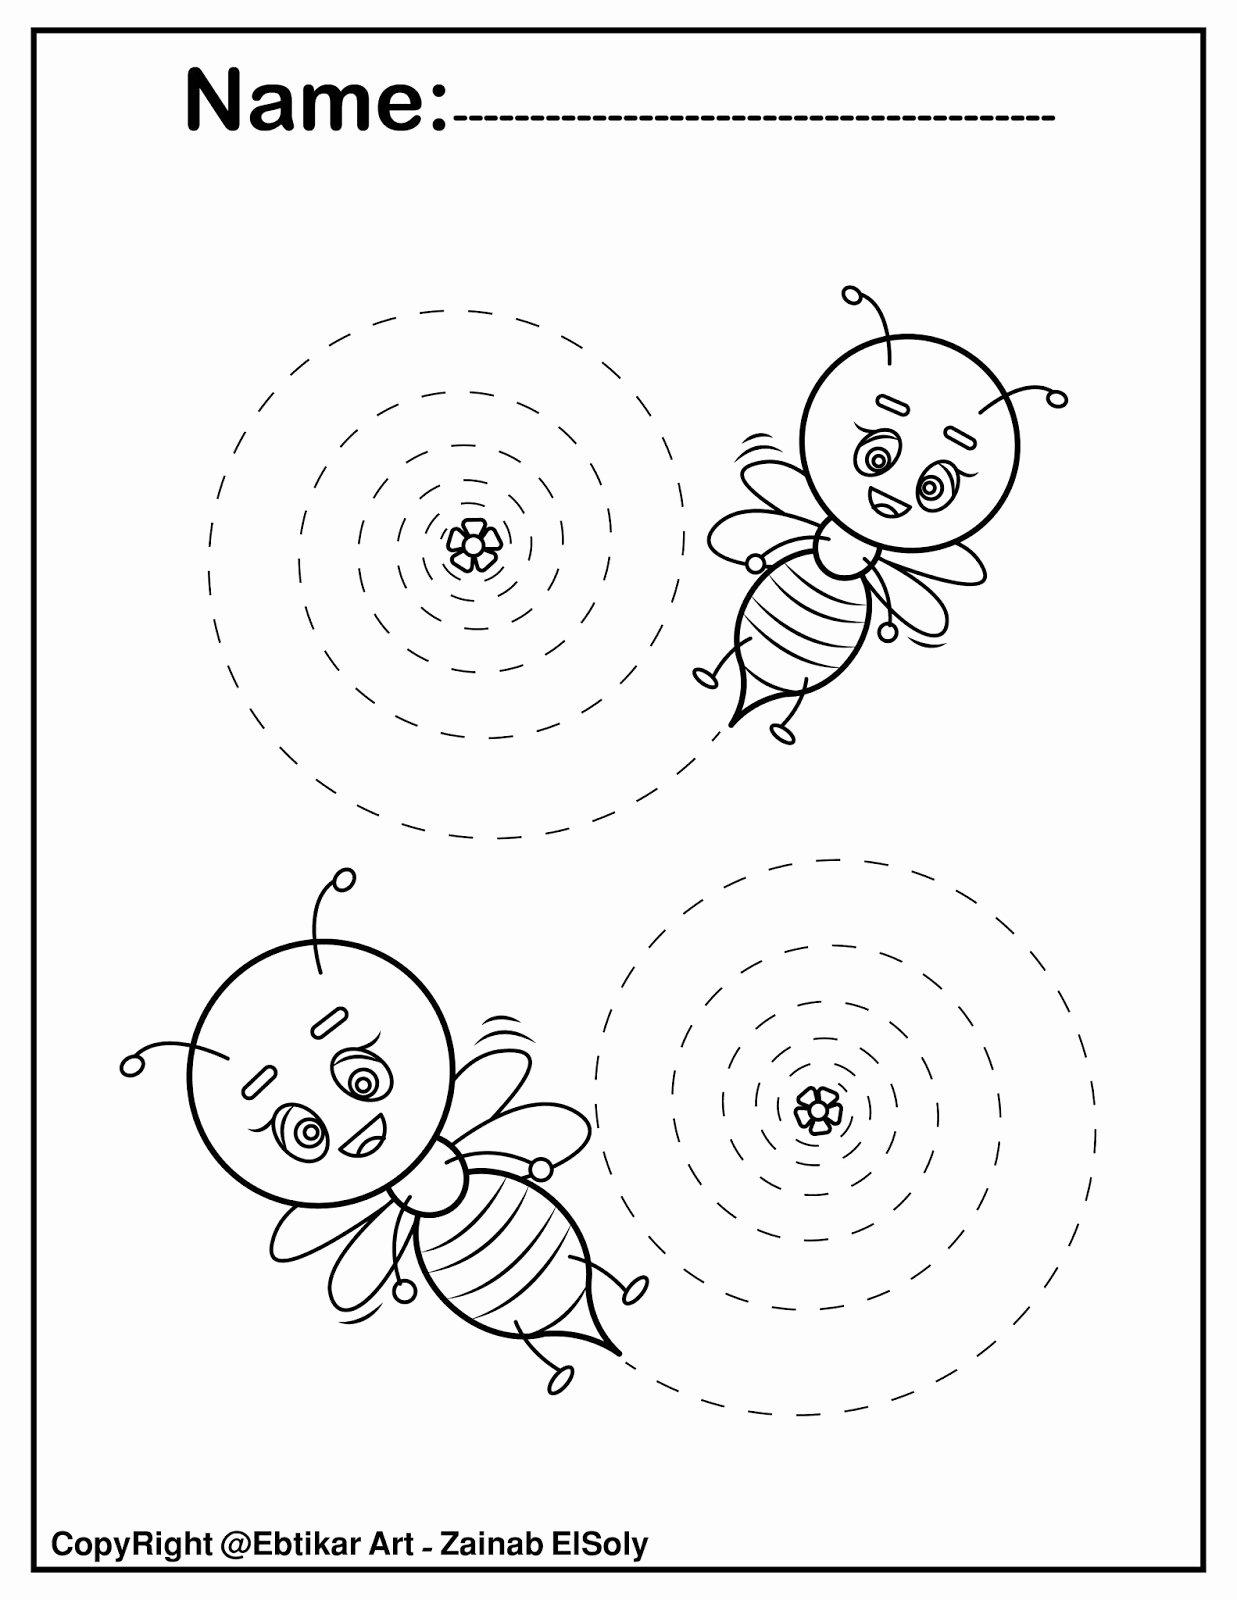 Trace the Lines Worksheets for Preschoolers Unique Worksheets Fine Motor Skills Tracing Lines Worksheets